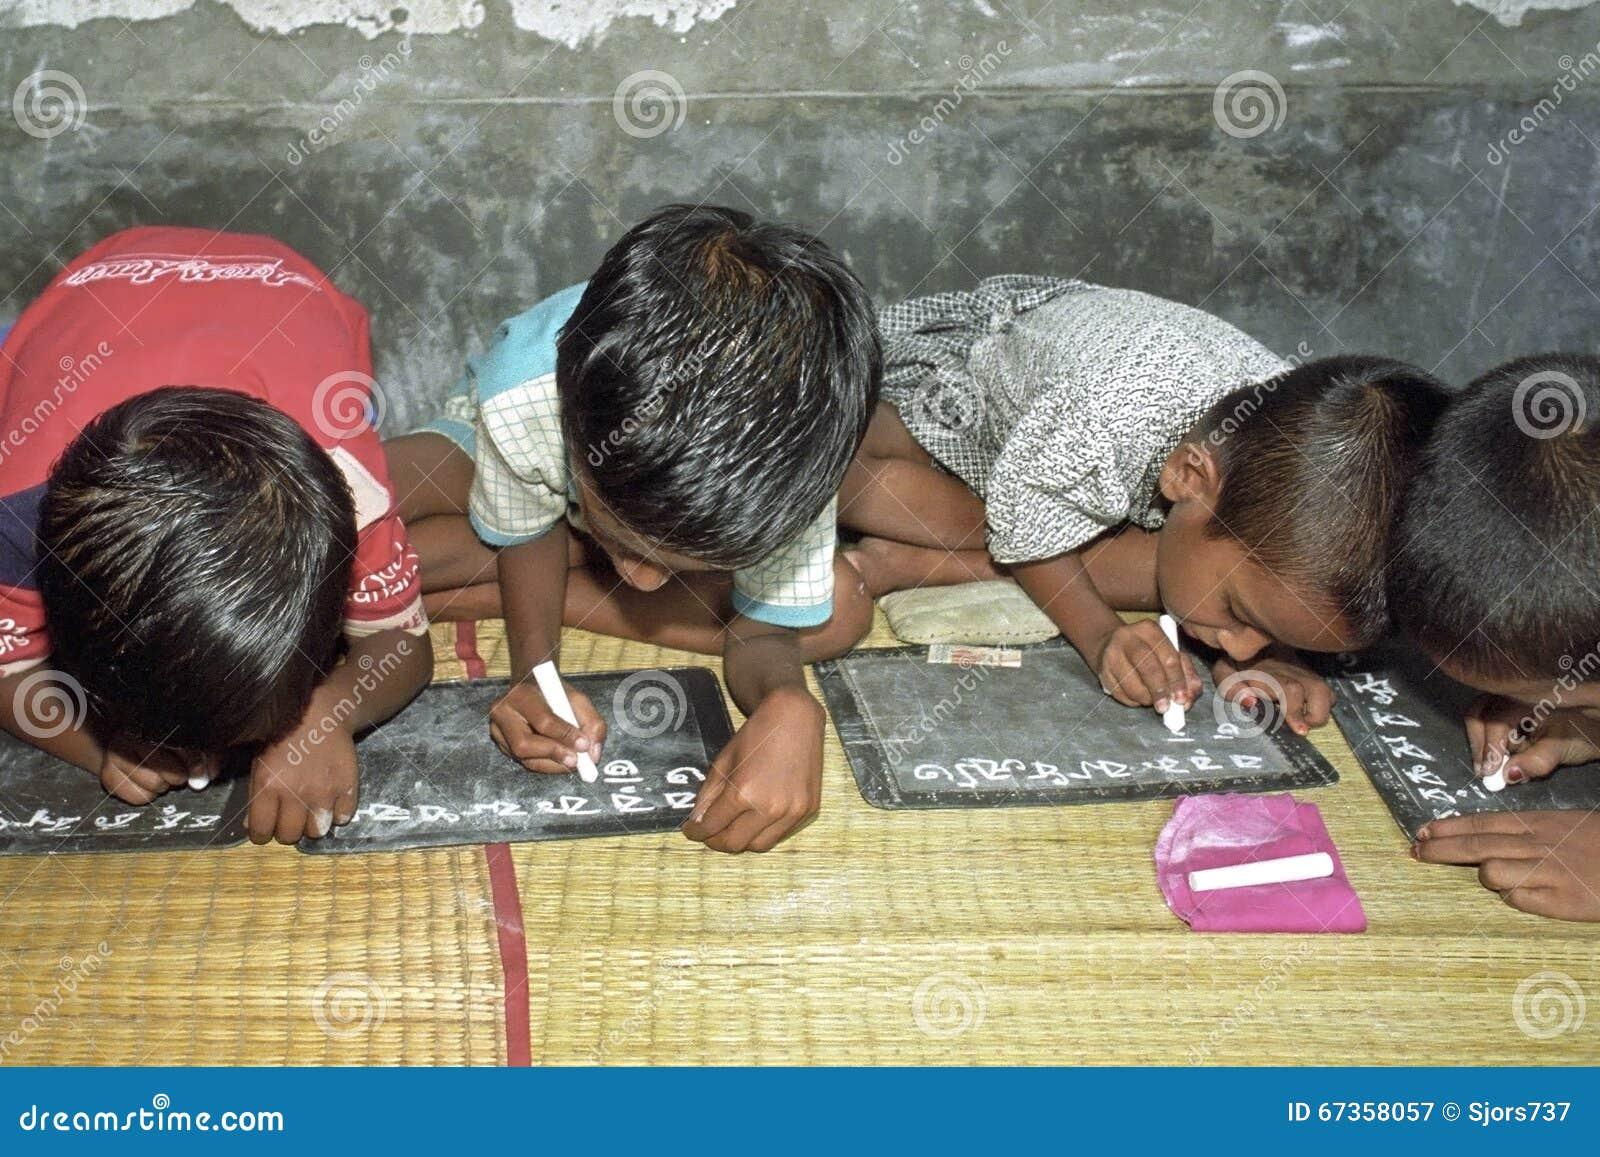 Business Plan writing Service in Bangladesh